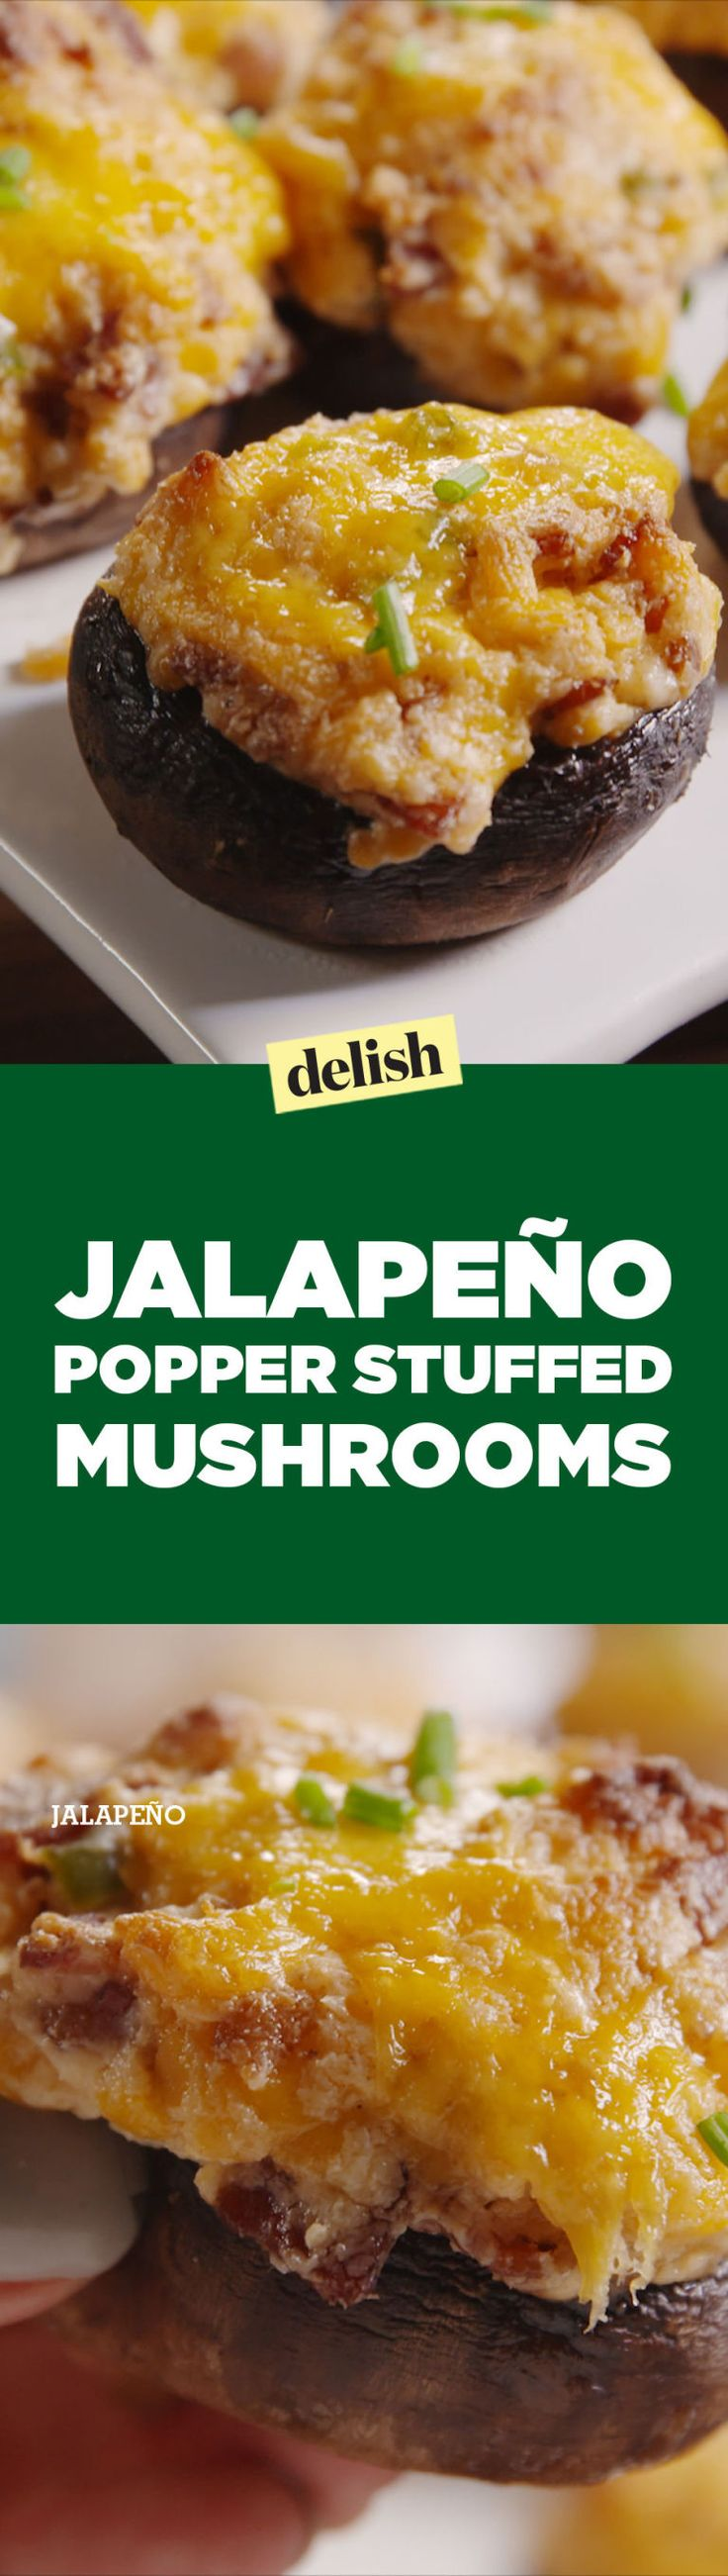 Jalapeño Popper Stuffed Mushrooms